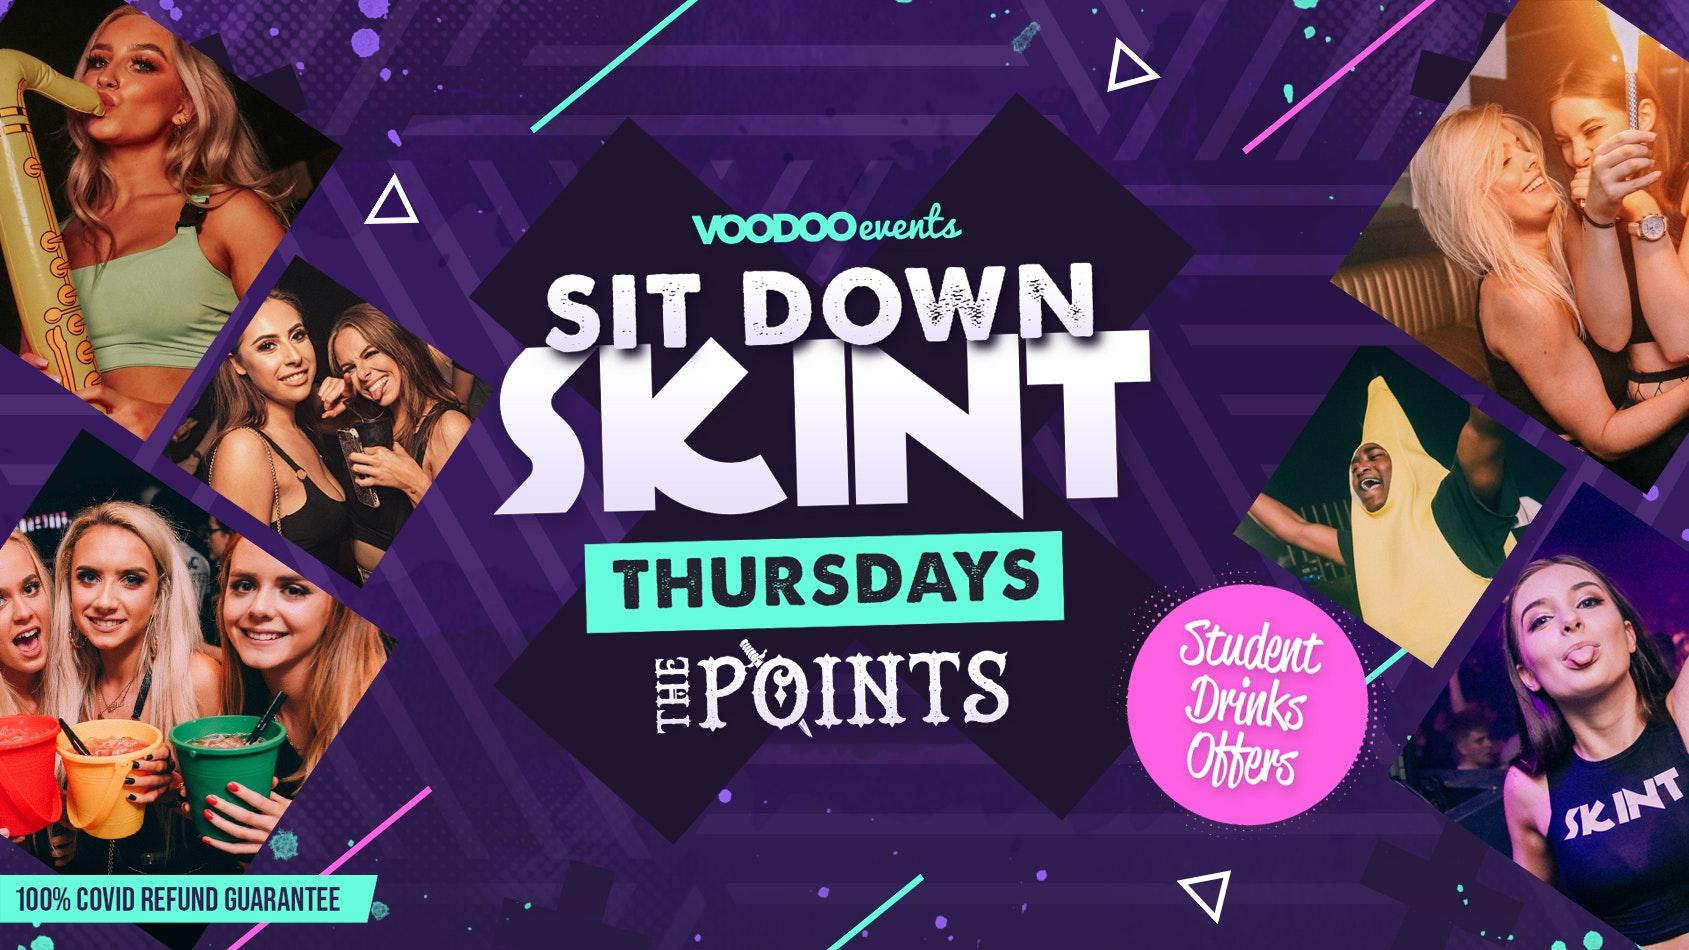 Sit Down Skint (Thursday)